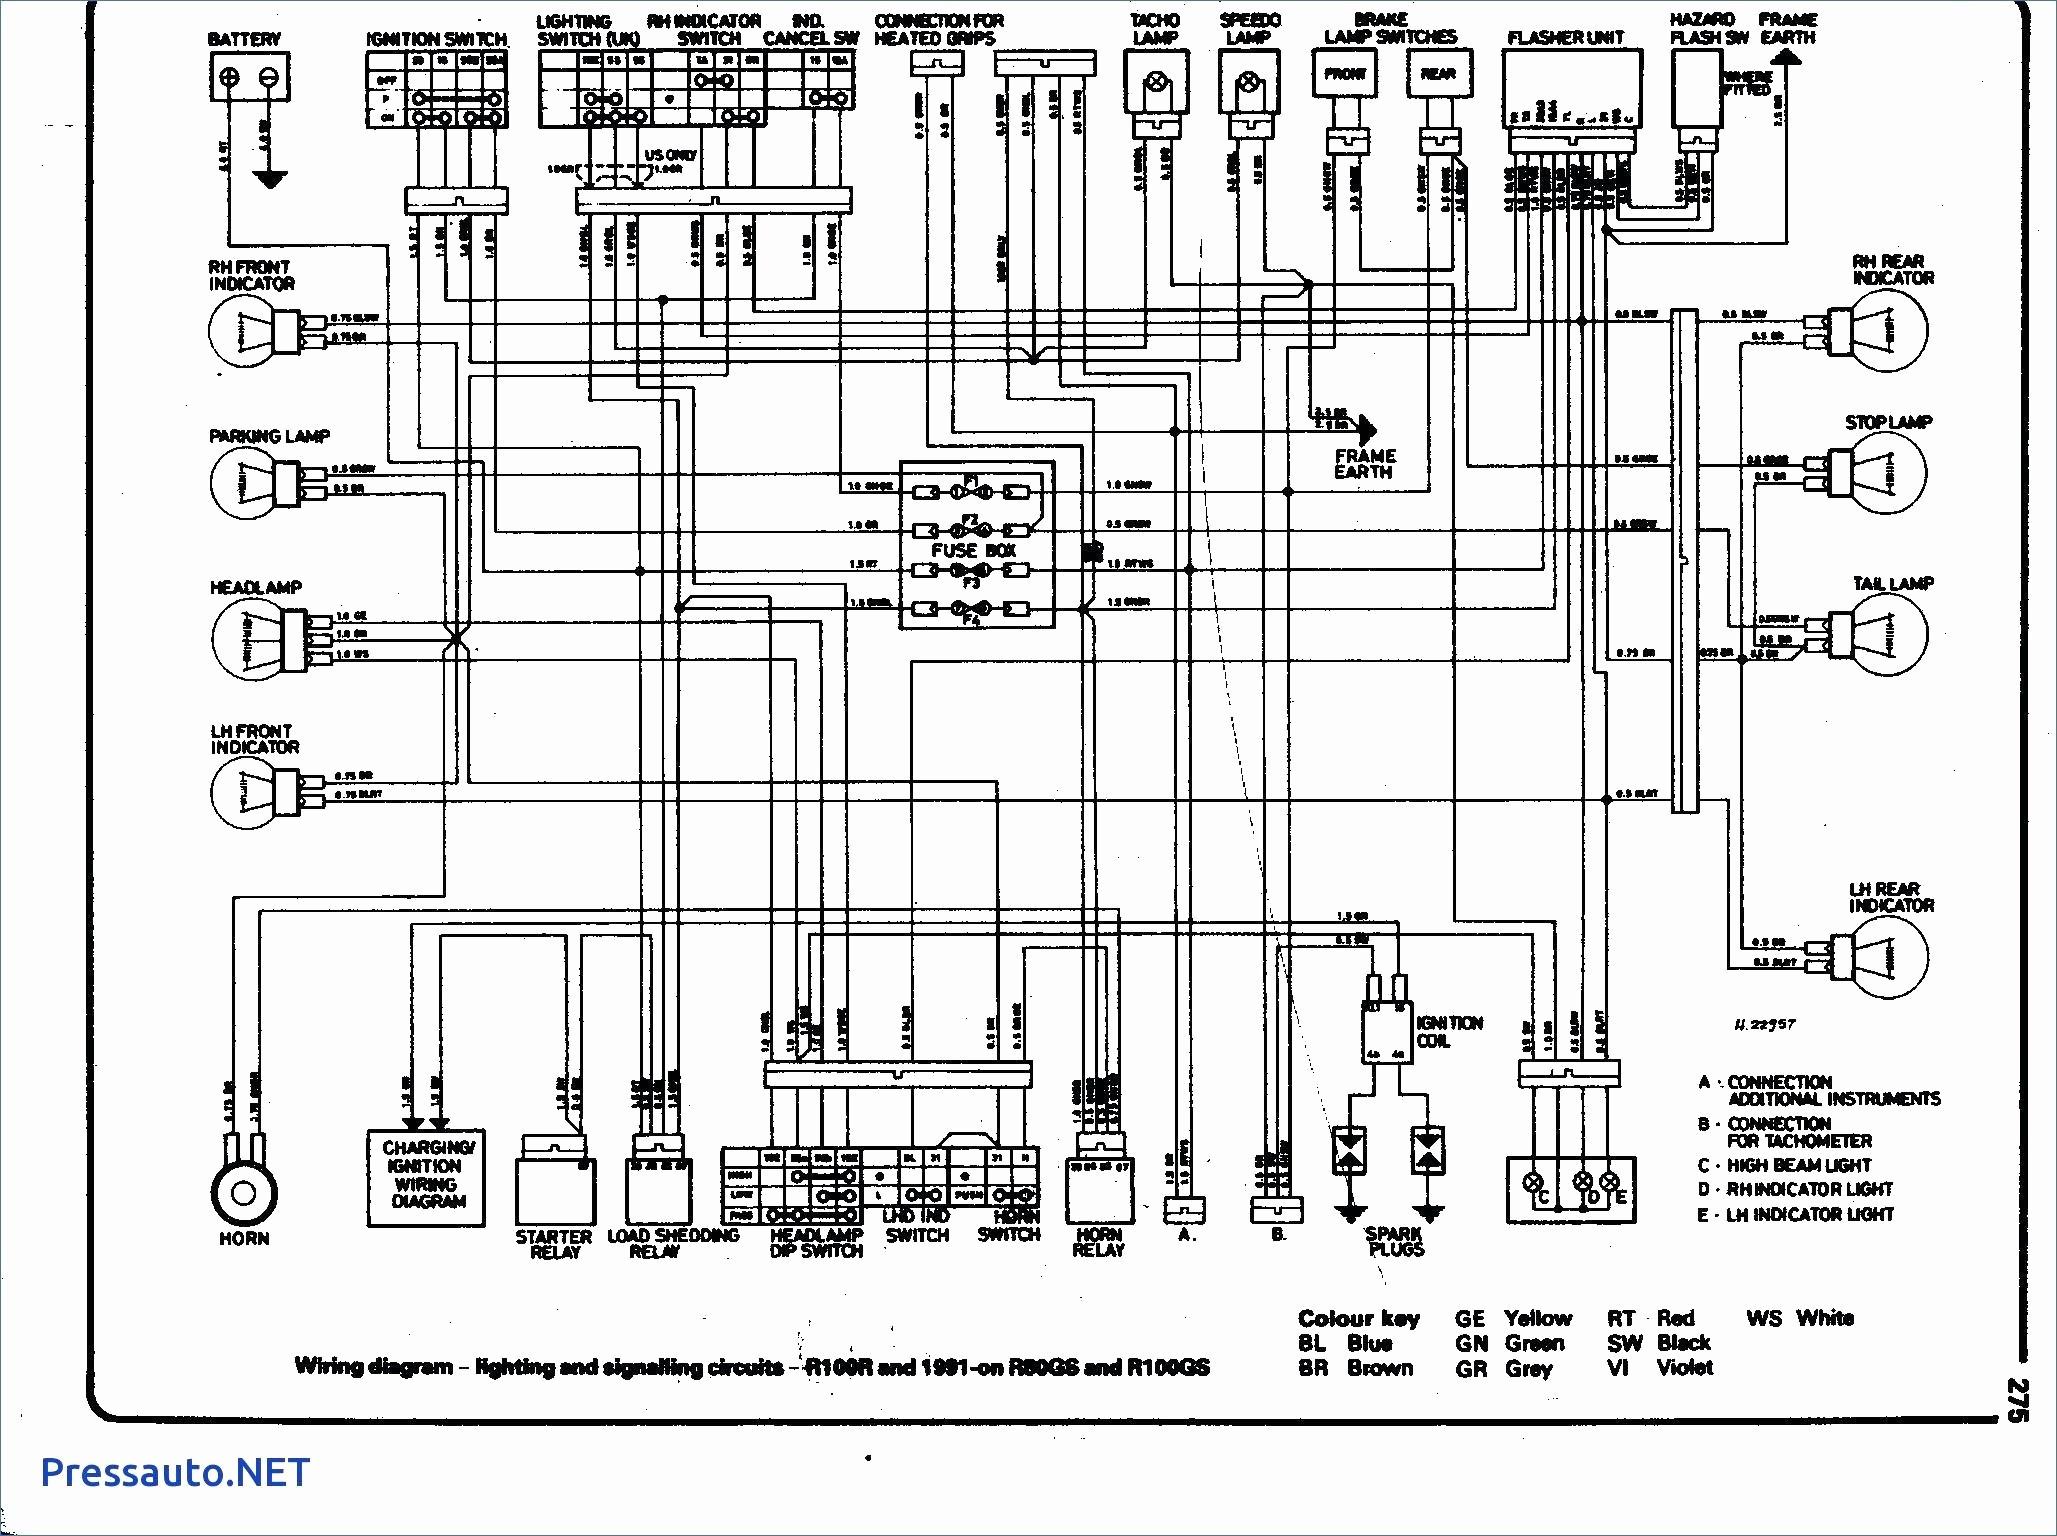 E47 Wiring Diagram - Wiring Diagrams Hubs - Meyer Snow Plow Wiring Diagram For Headlights